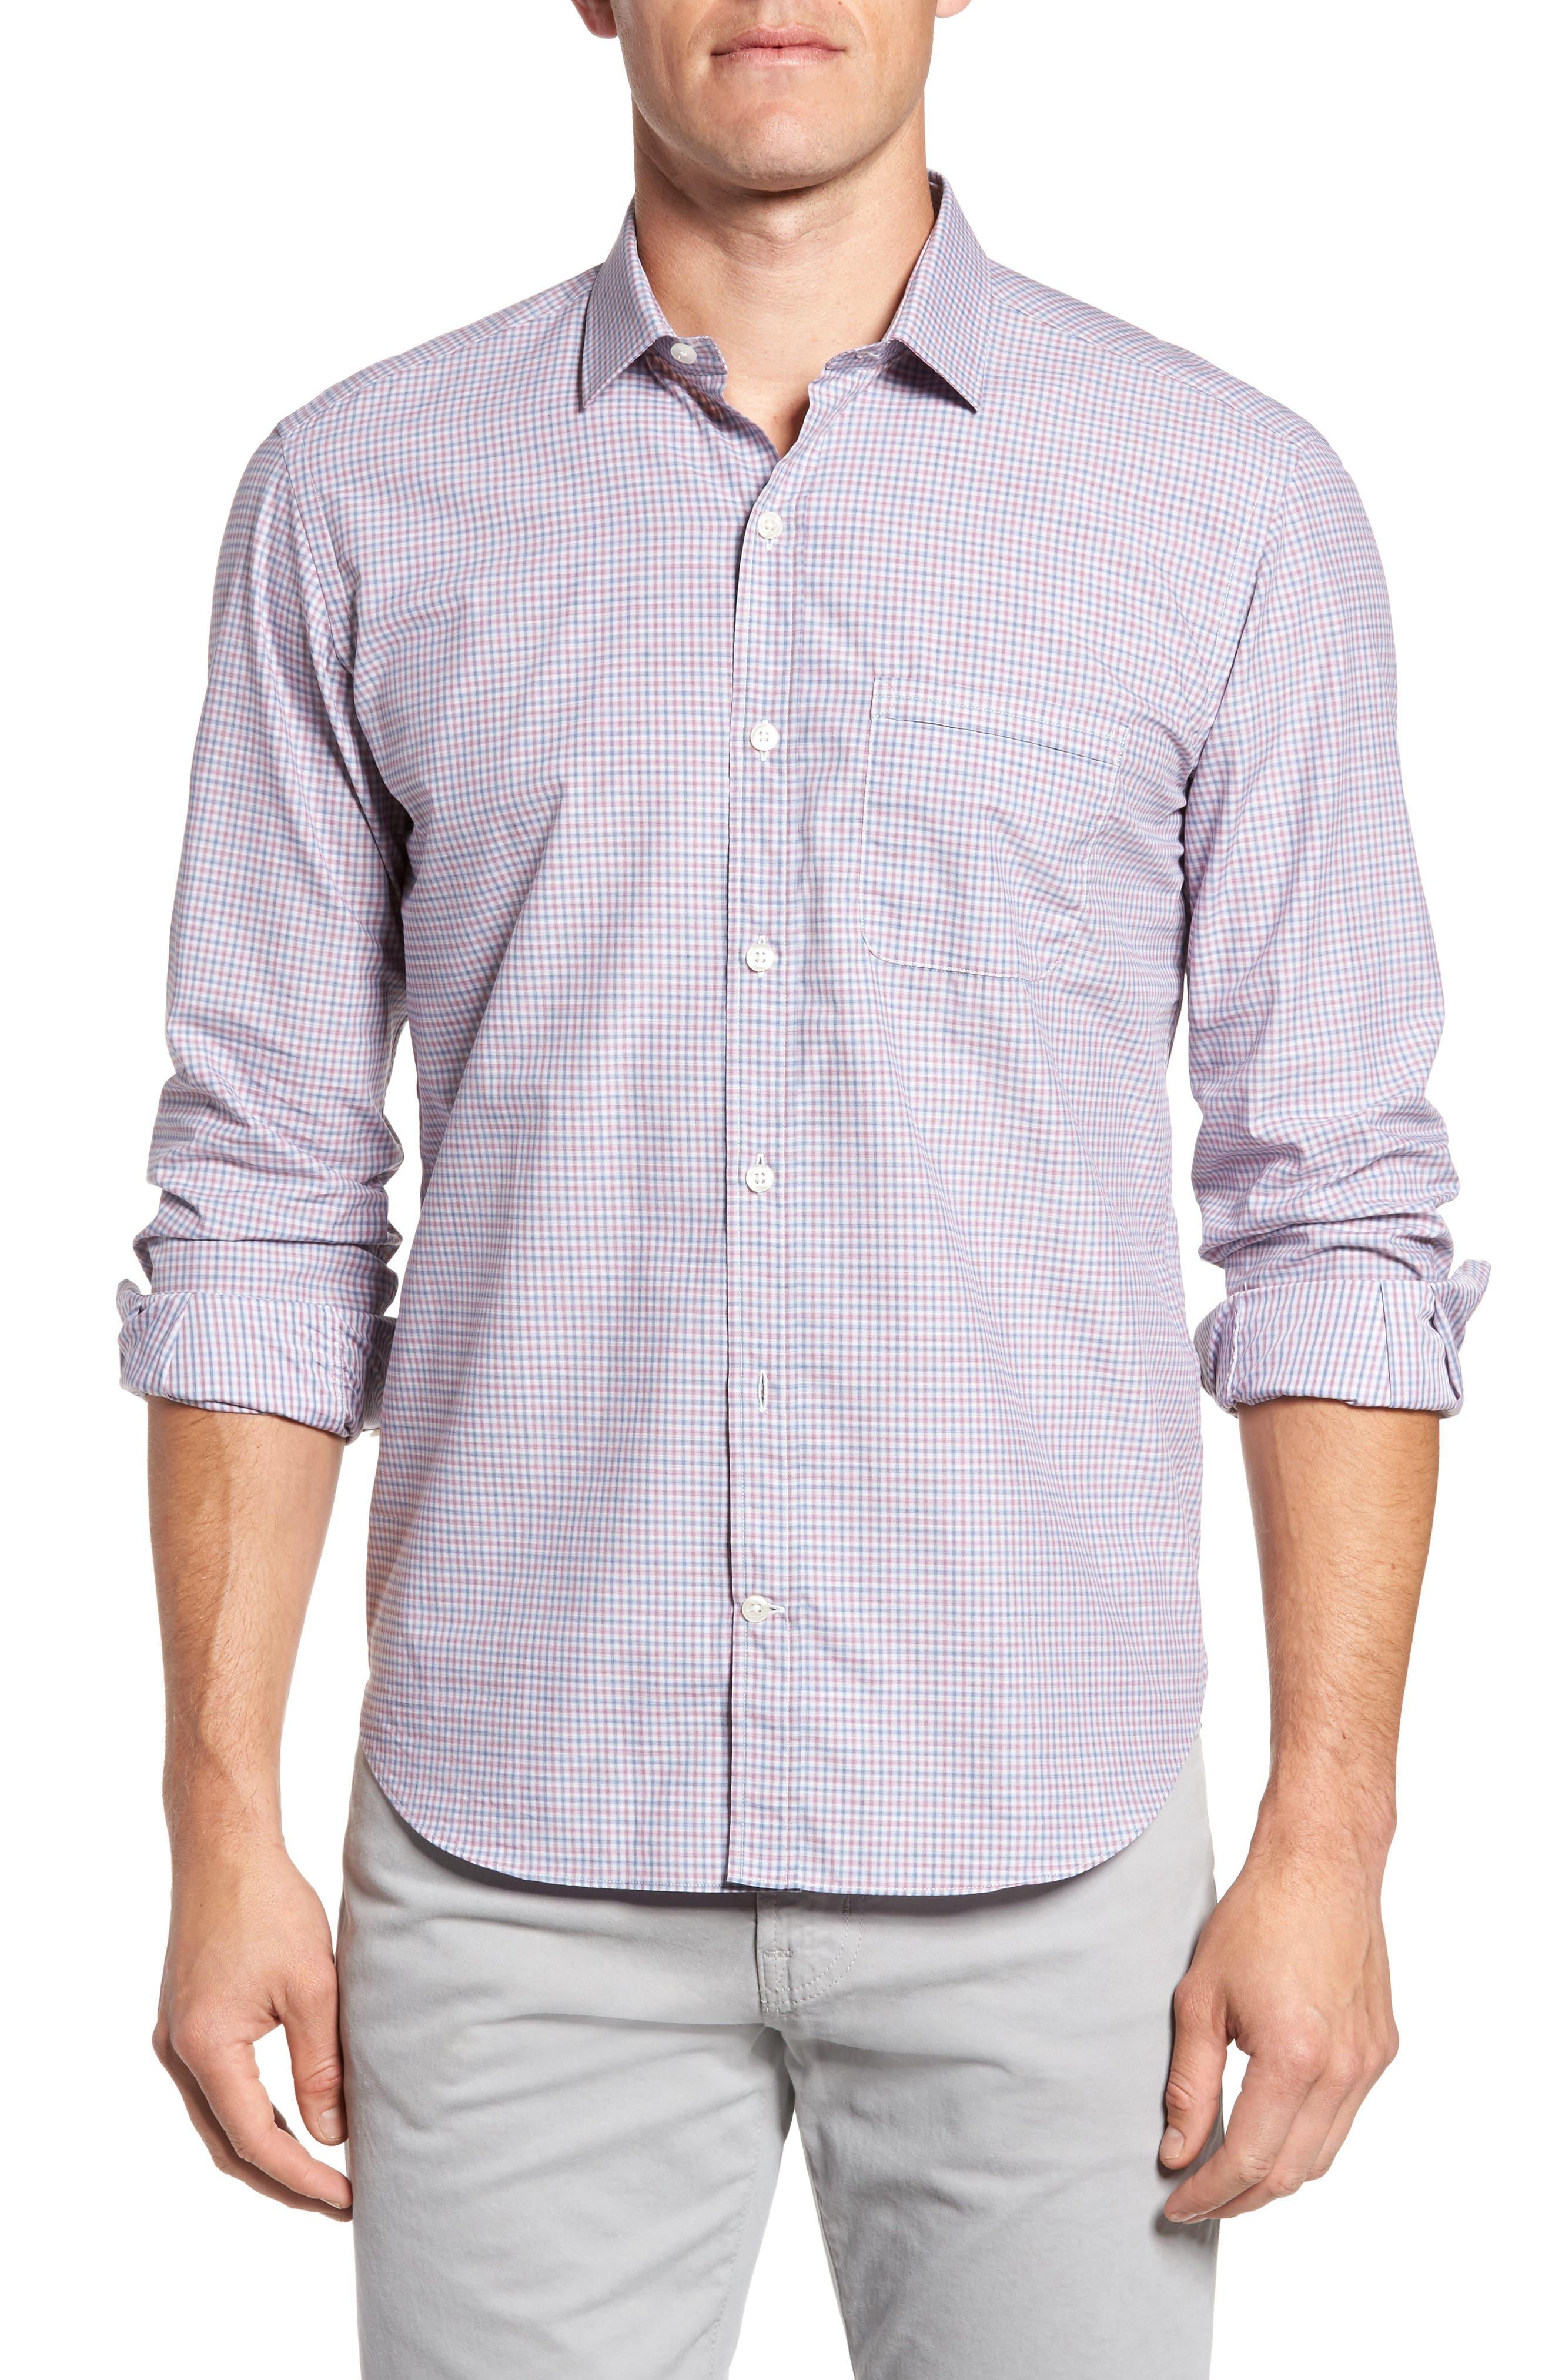 Alternate Image 1 Selected - Culturata Trim Fit Mini Plaid Sport Shirt